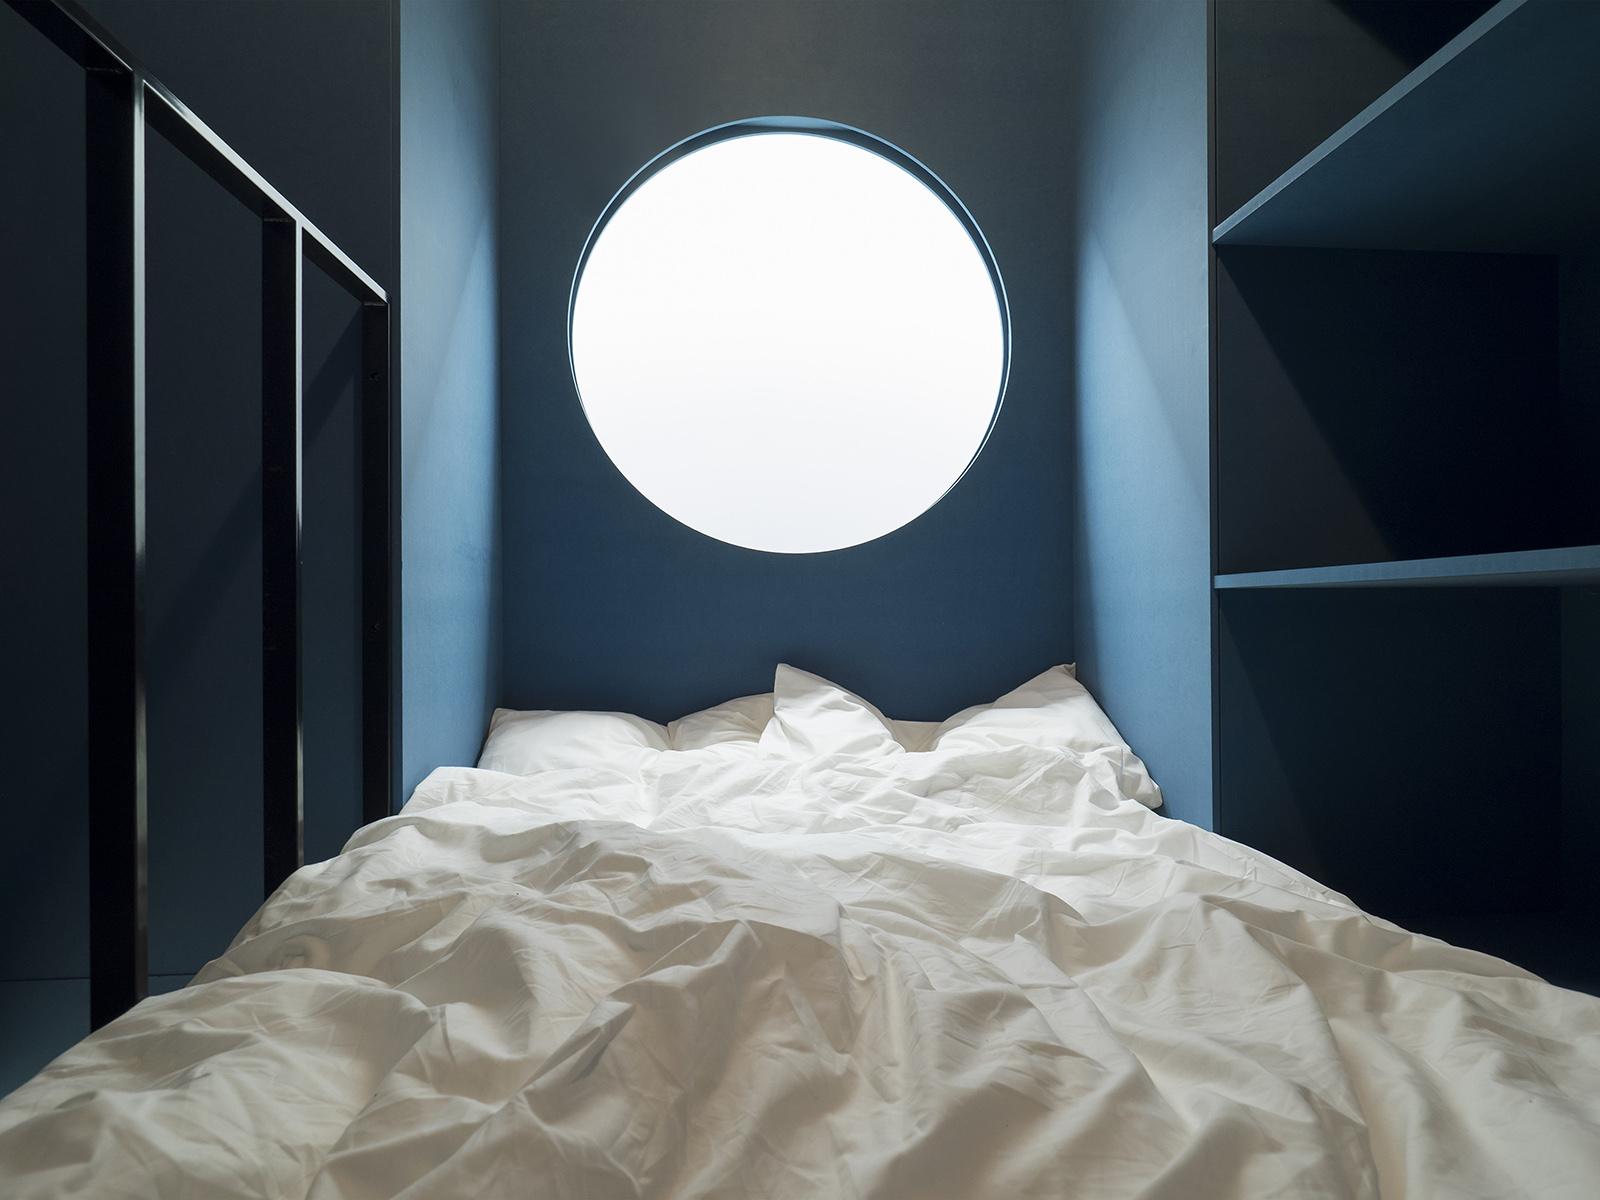 'Months' room, <em>Home Economics</em> at the British Pavilion, Venice Architecture Biennale 2016 Photography: Cristiano Corte, courtesy British Council